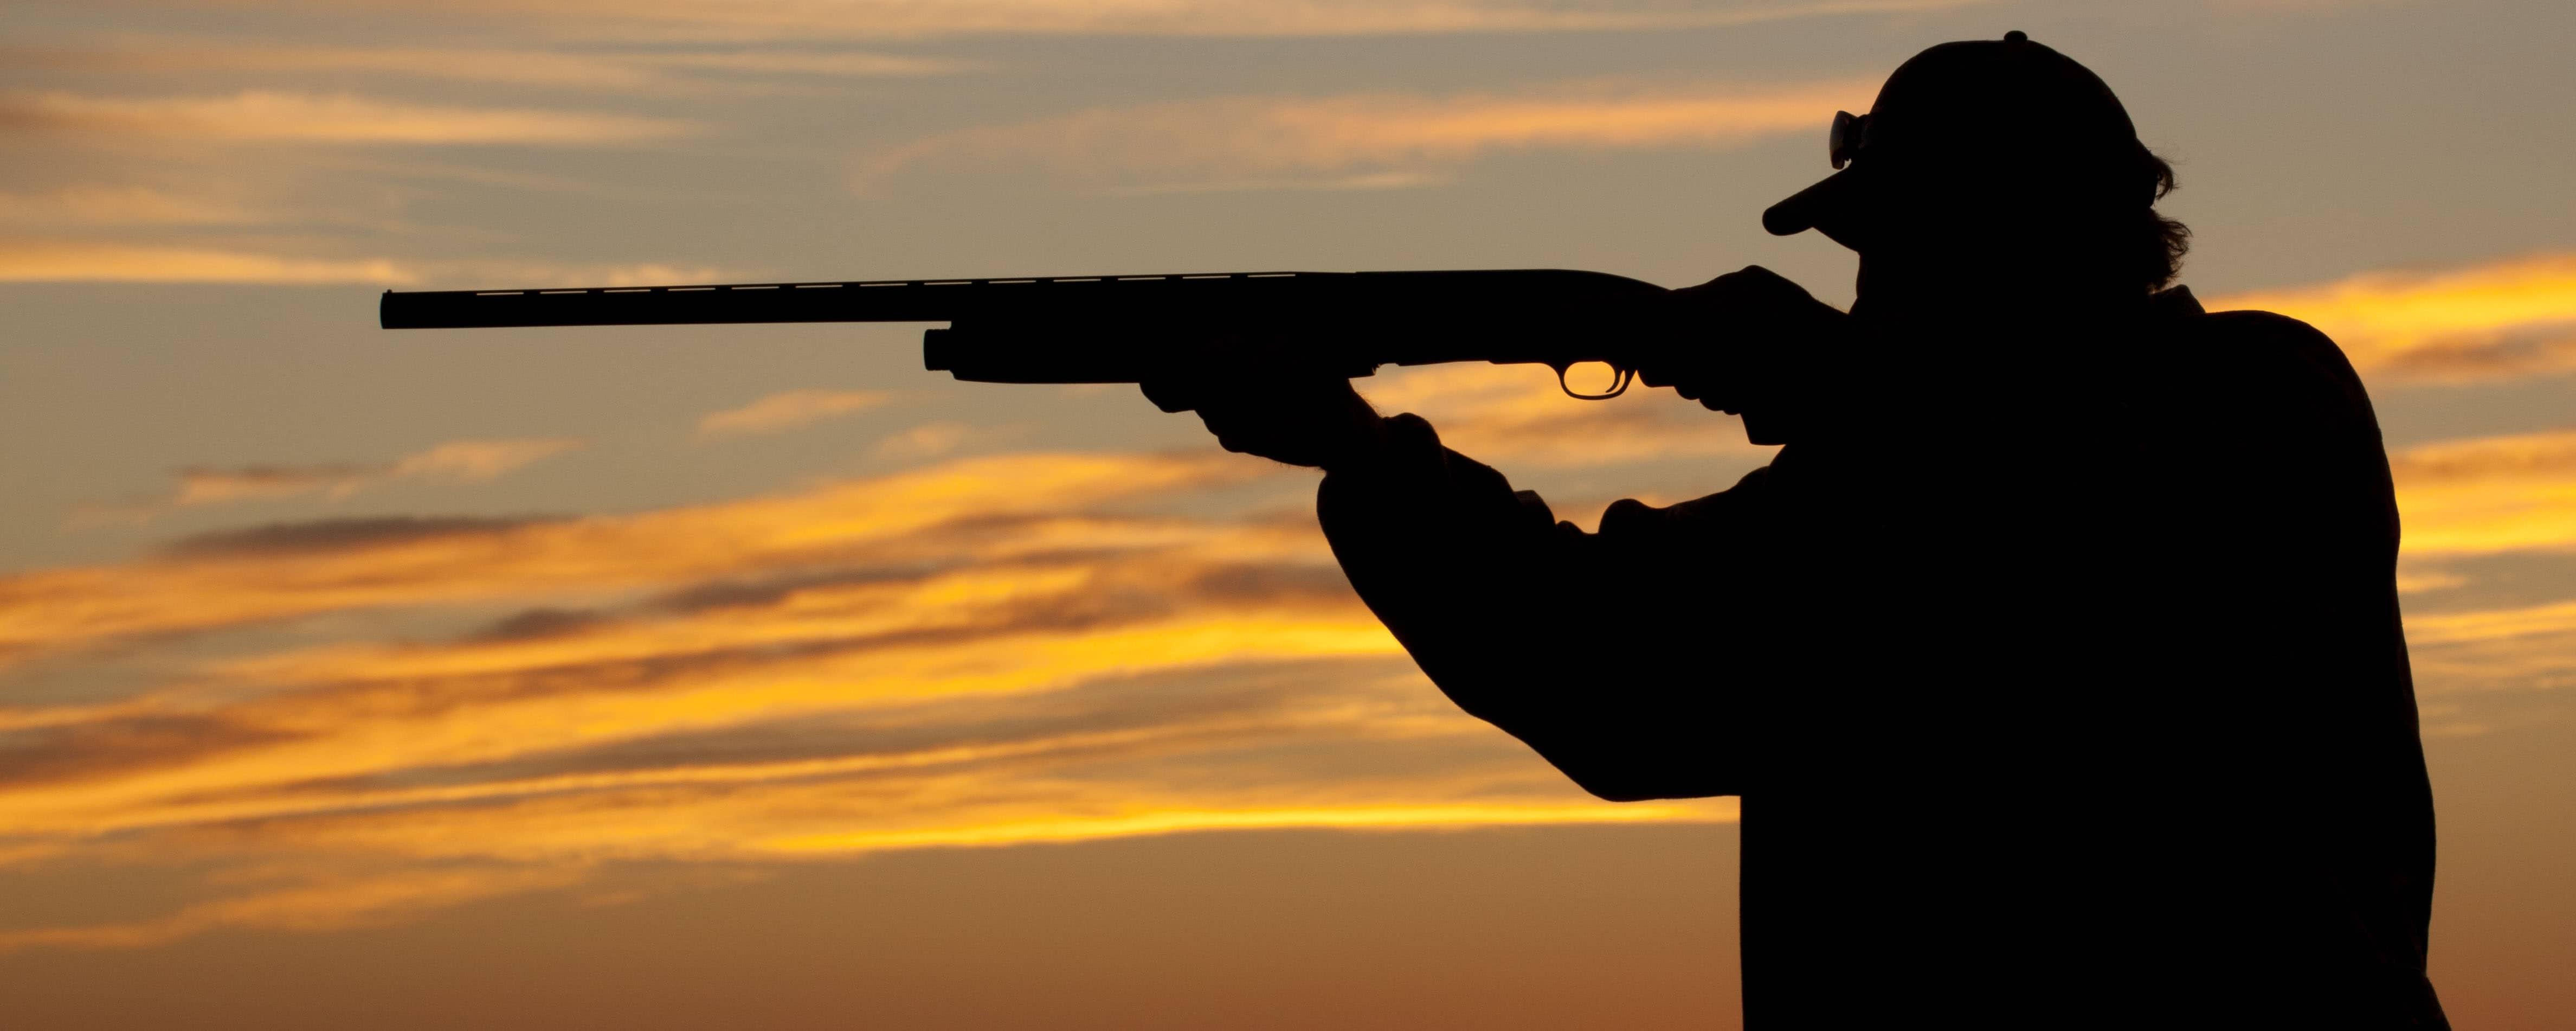 shooter-sunset-edited-min